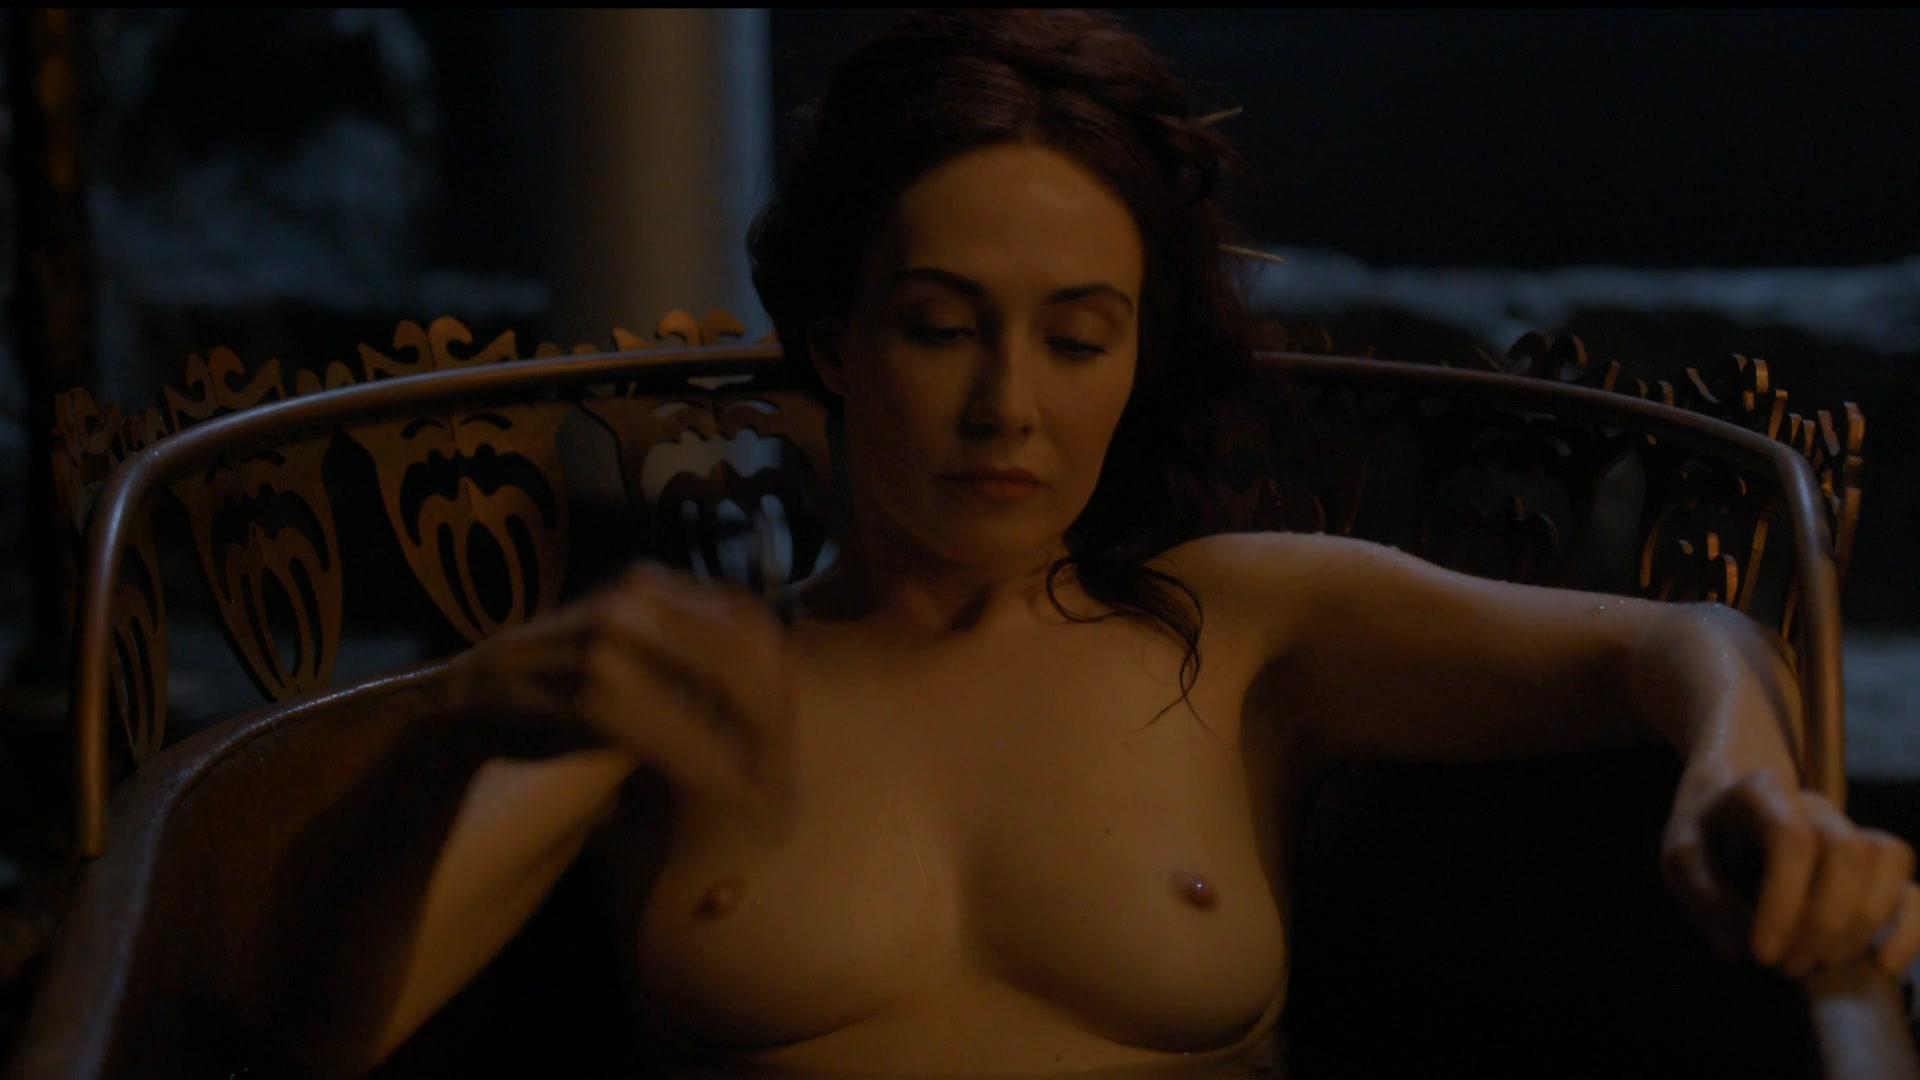 American bisex porn